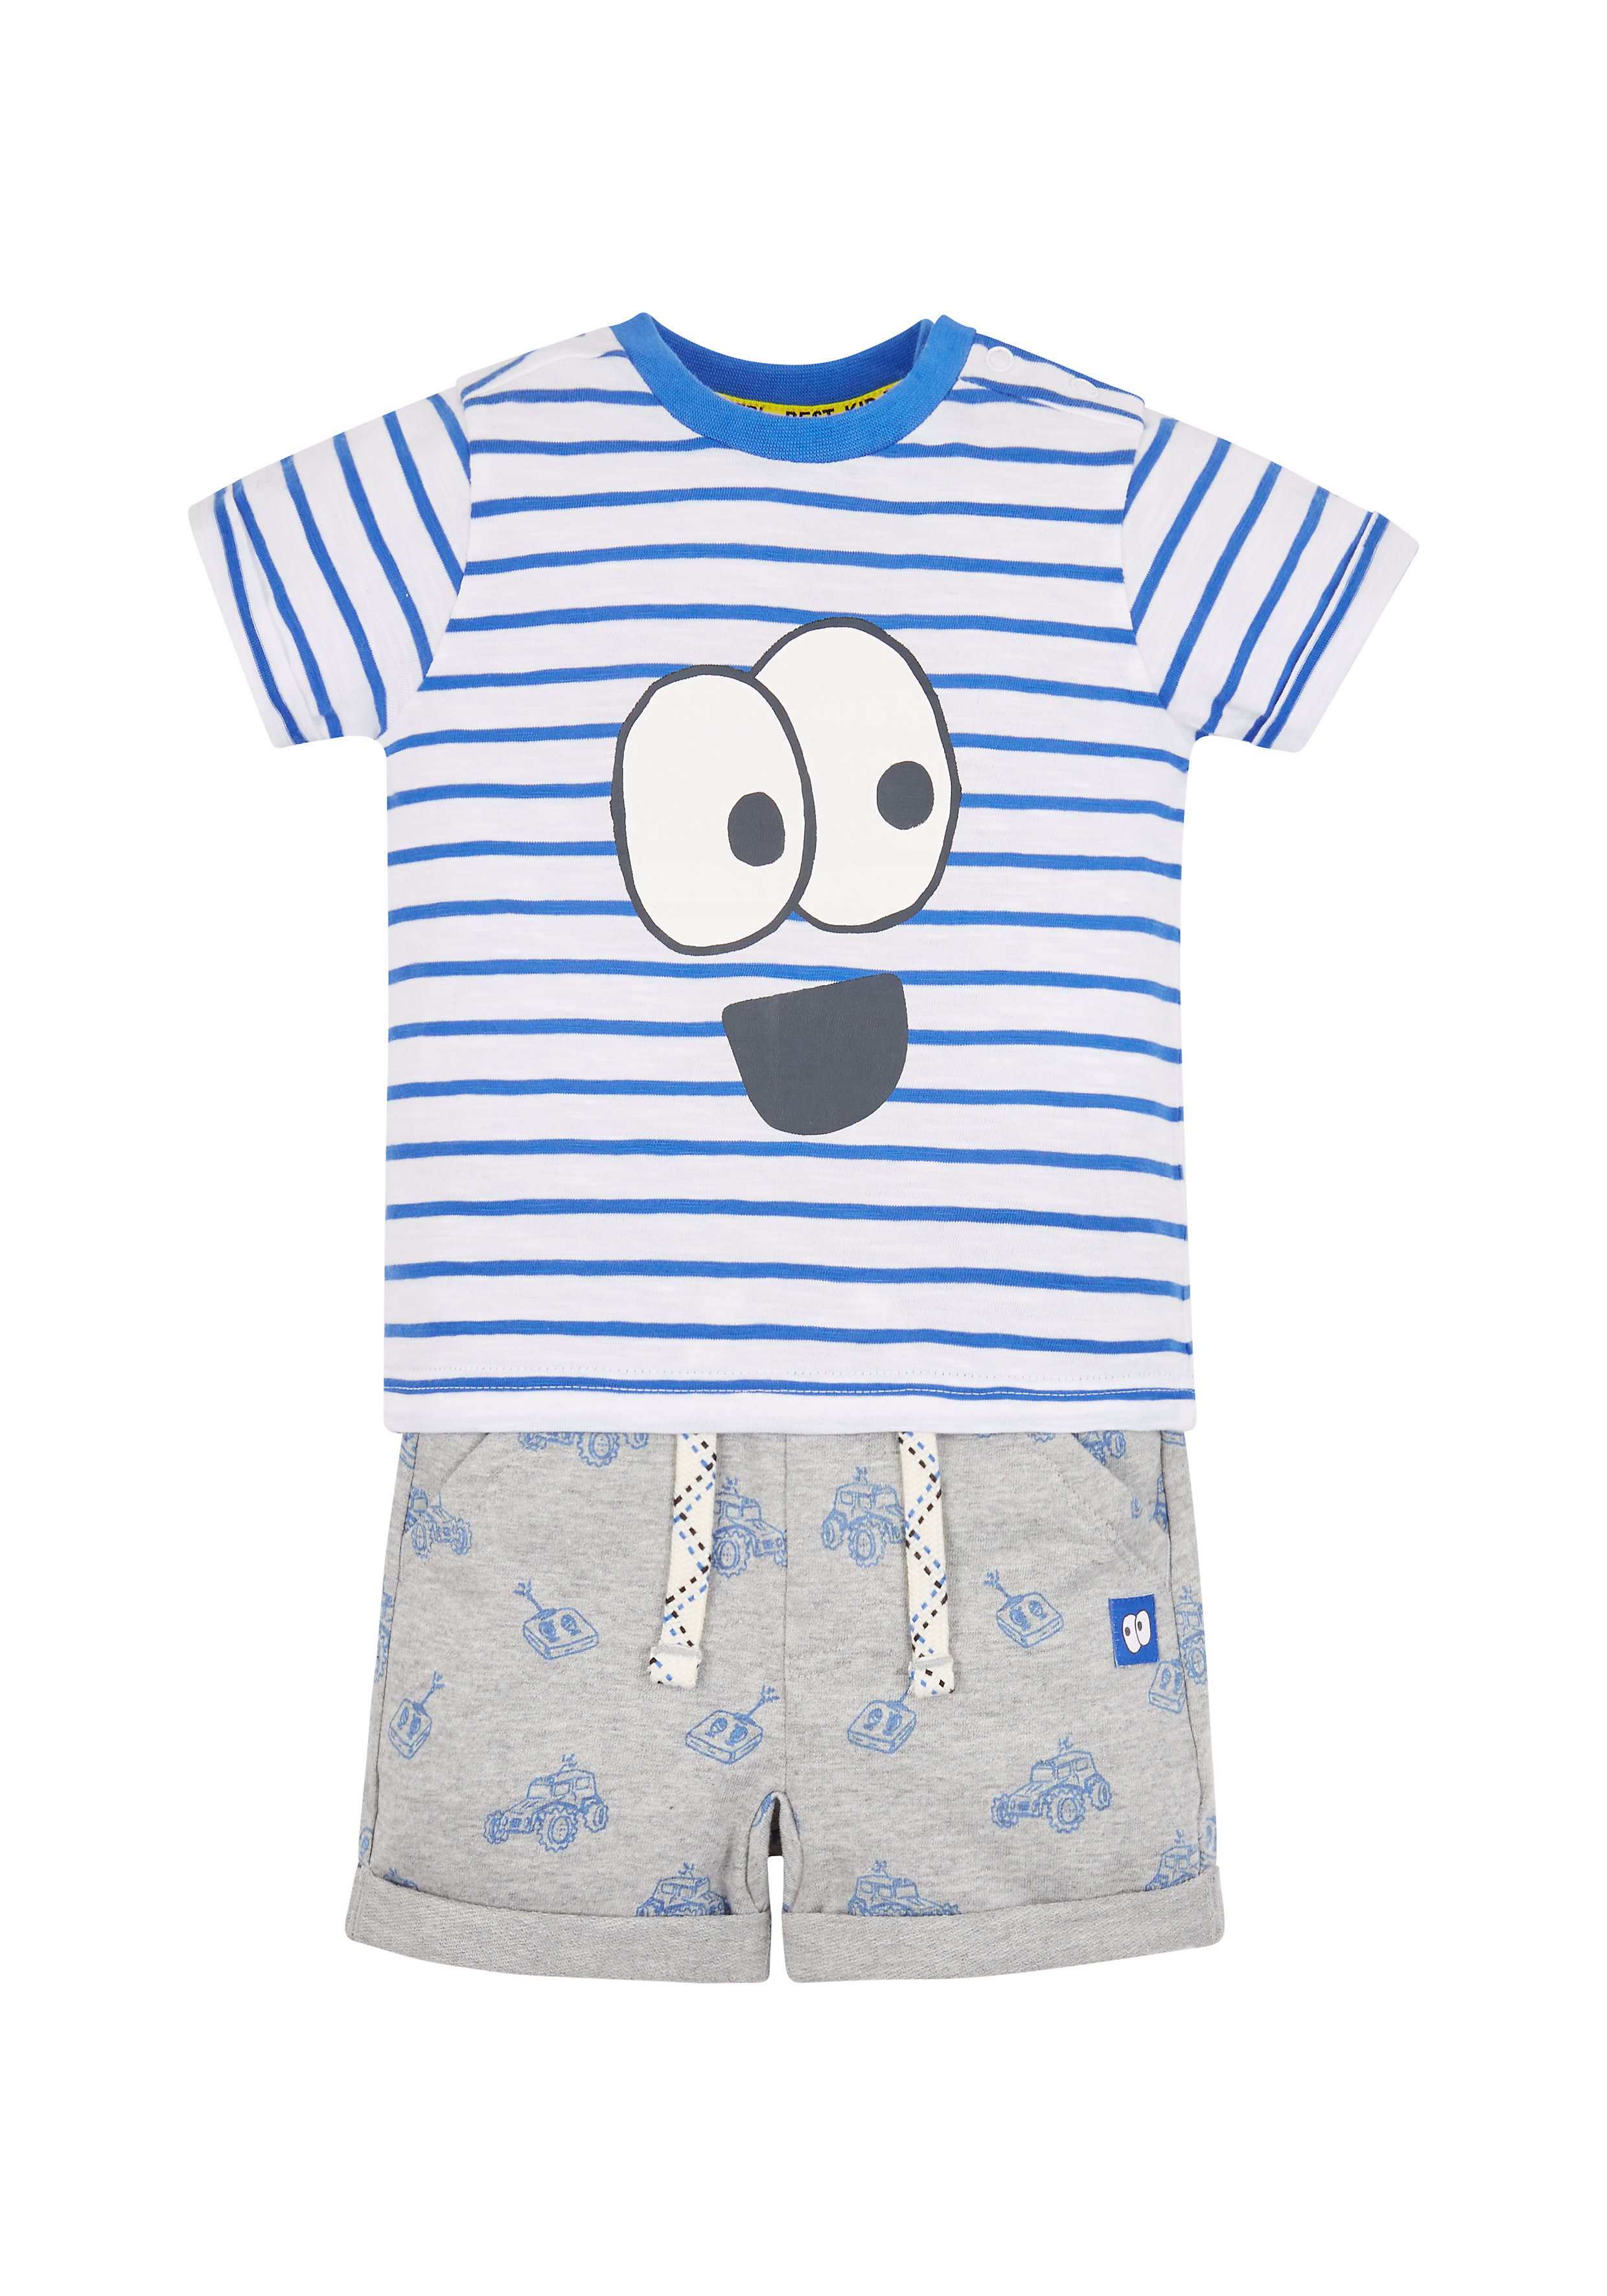 Mothercare | Boys Half Sleeves T-Shirt And Shorts Set Striped - Grey